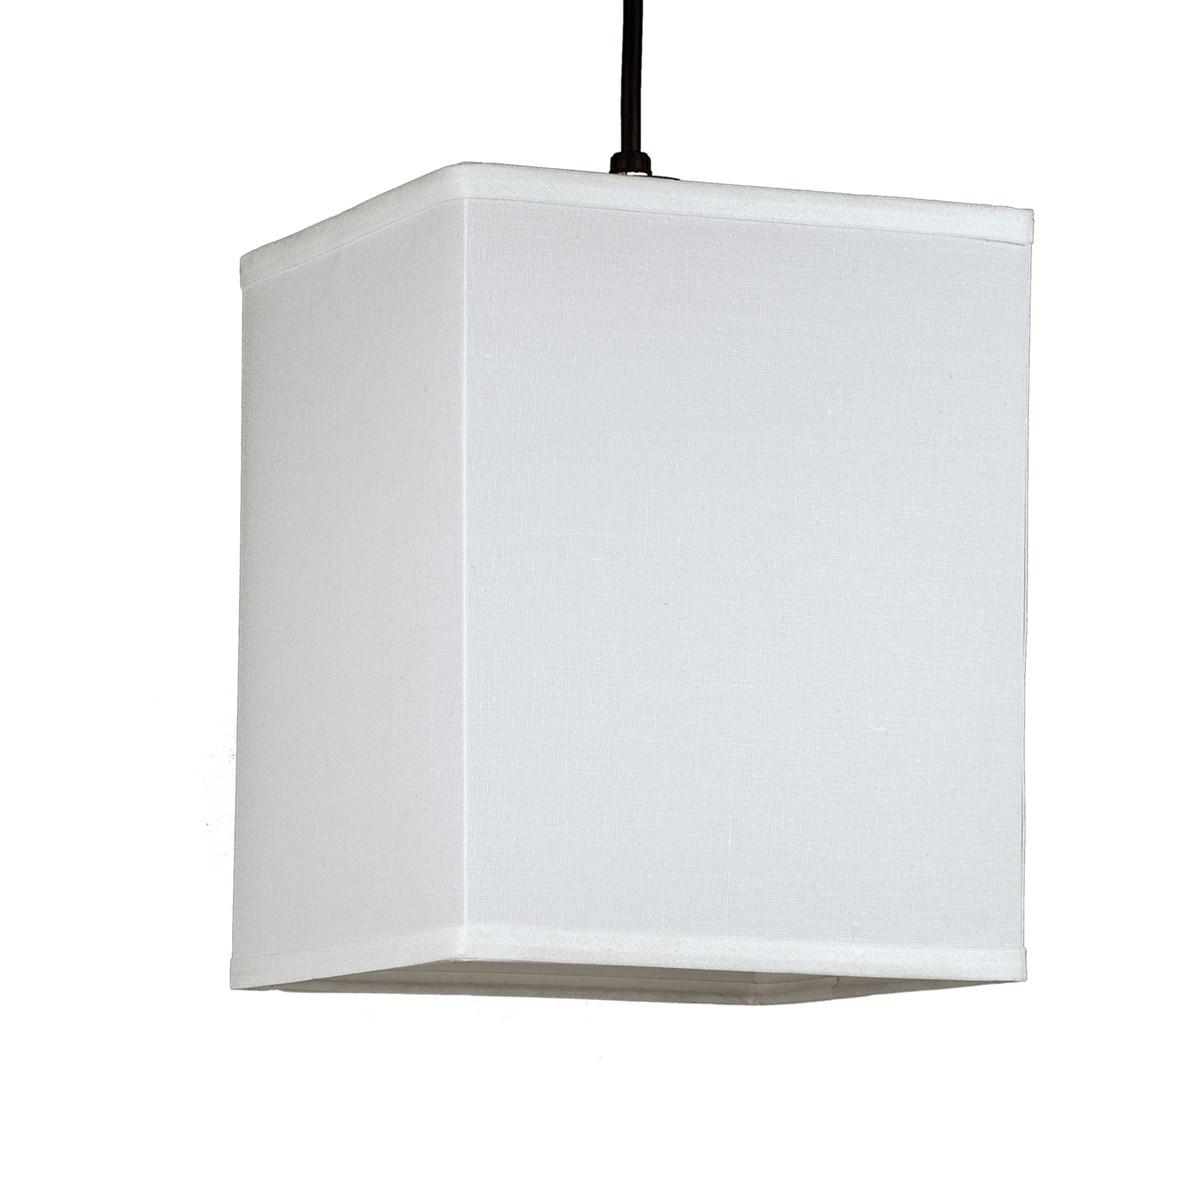 Lights Up Rex Small Square Pendant Light, Pendant Fixture | Neenas Lighting